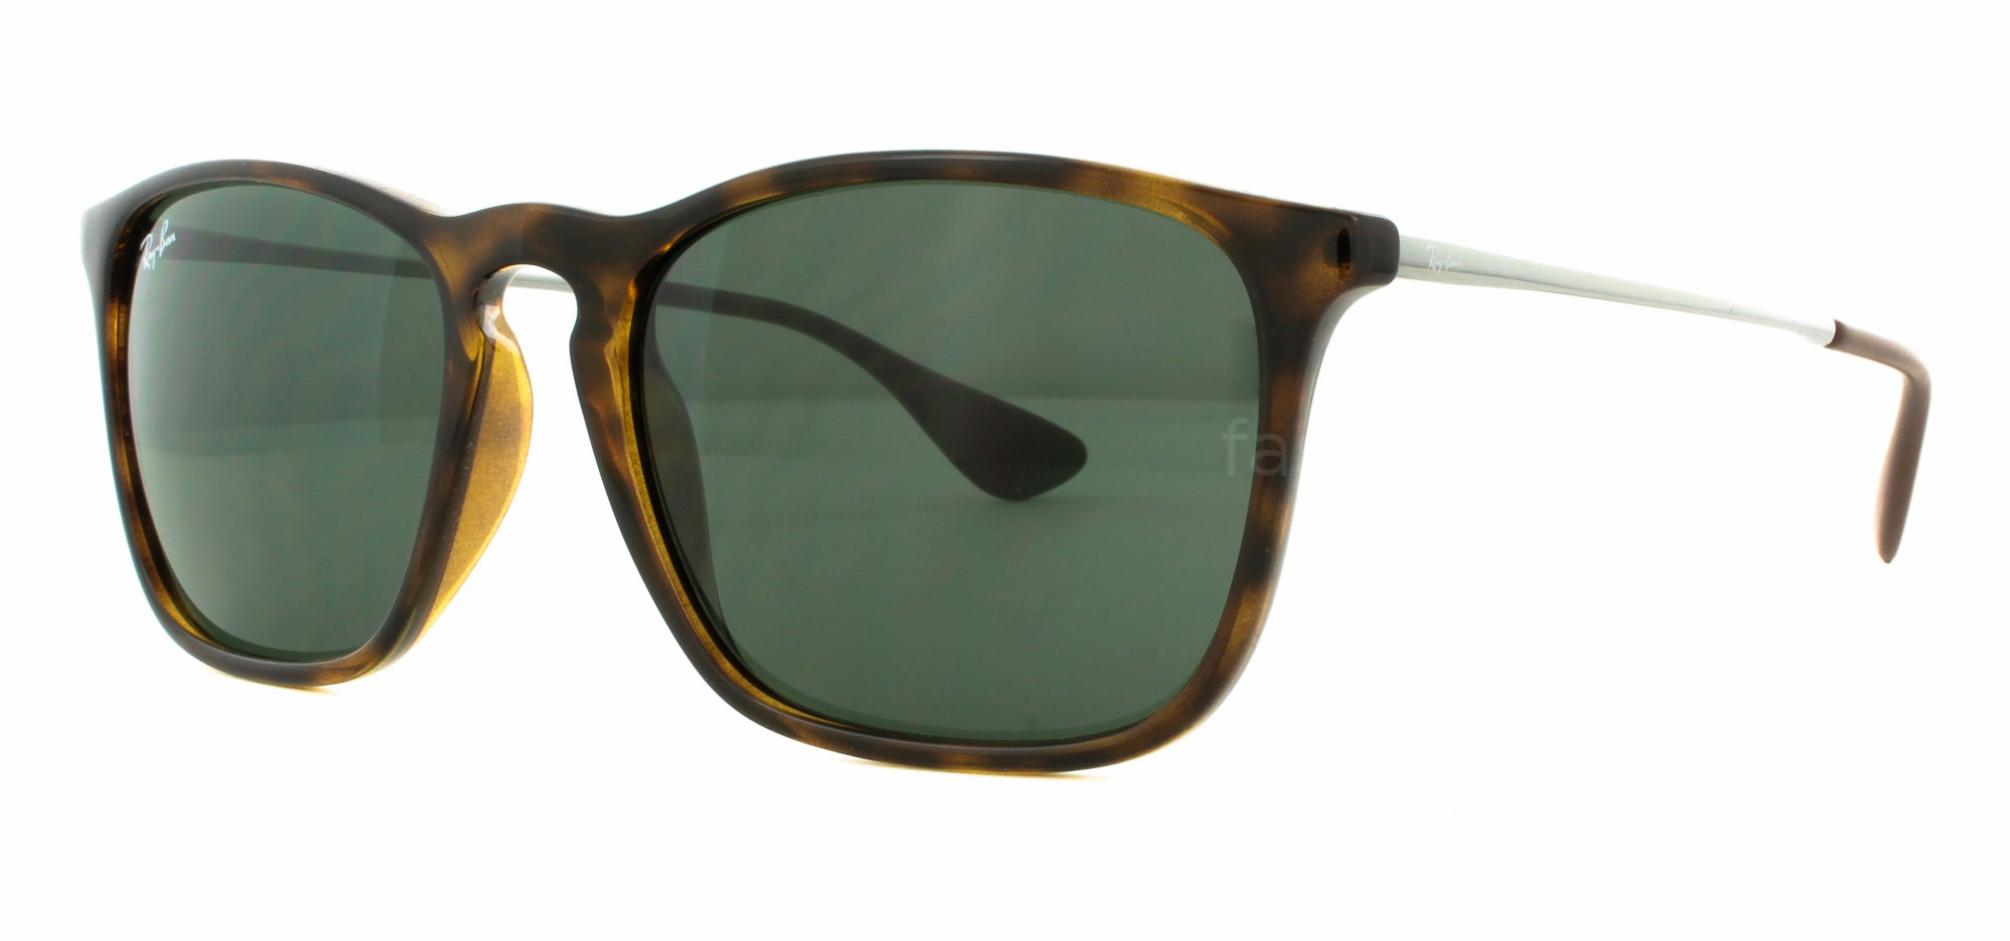 6a4c825109a Ray Ban 4187 Sunglasses